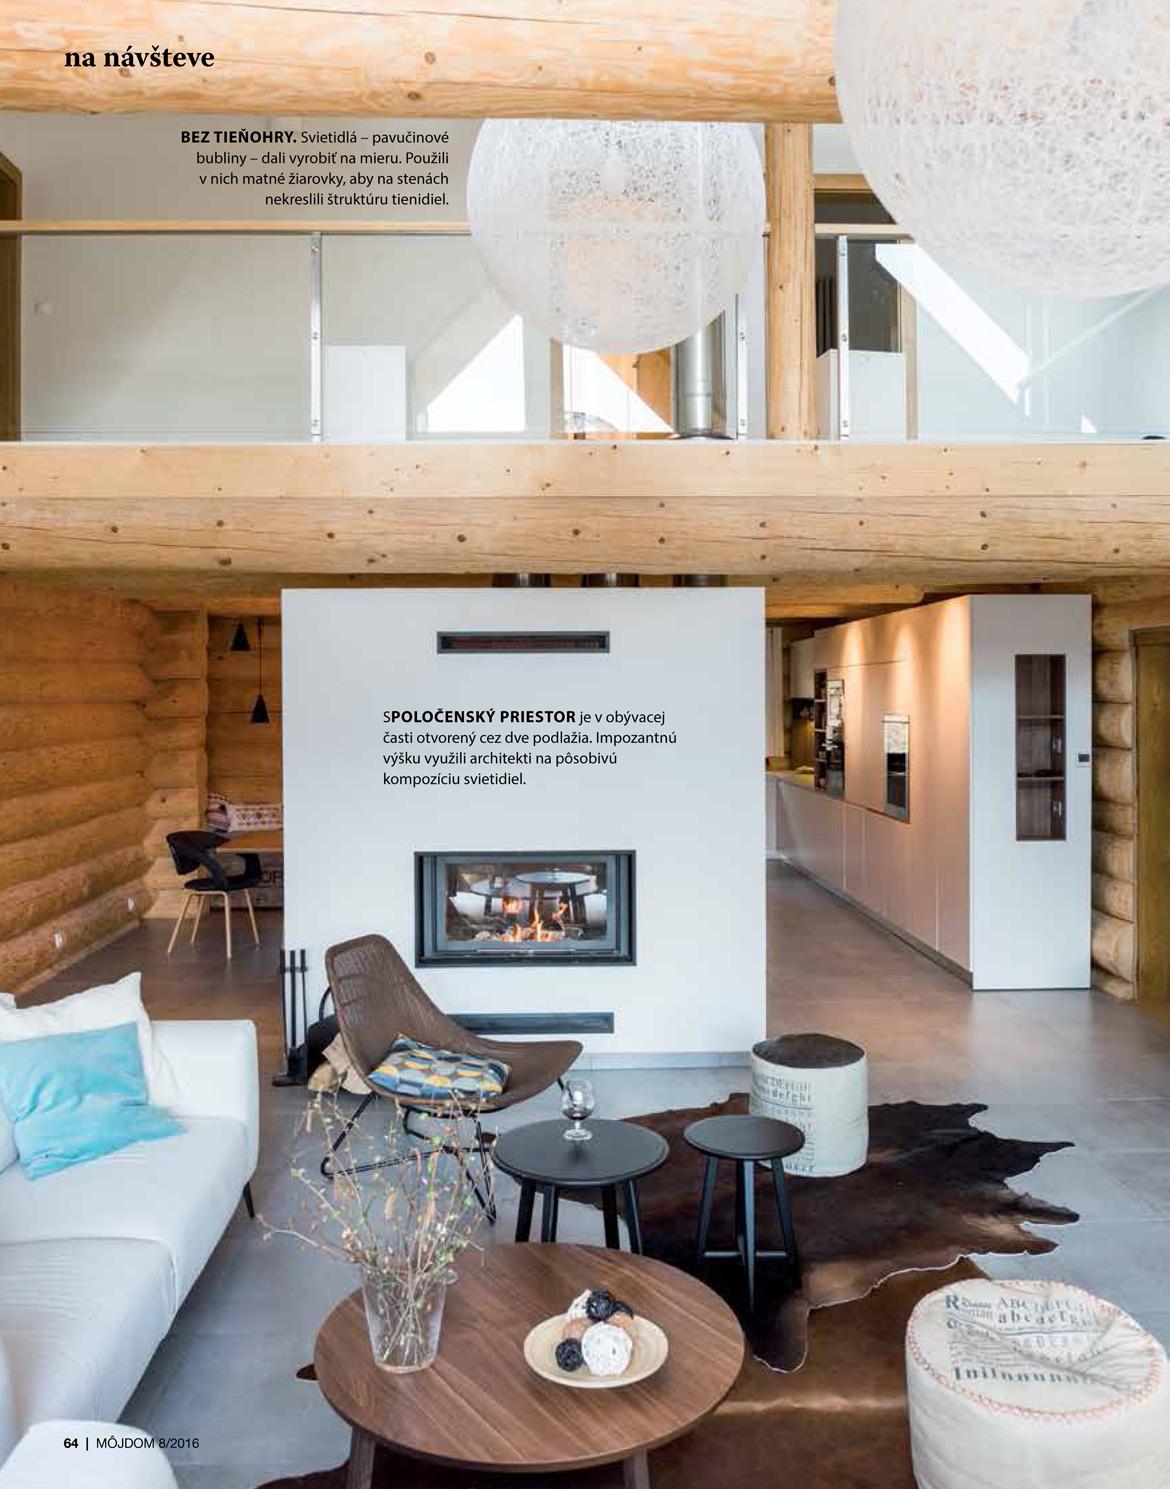 009-interier-zrub-tale-mojdom-pavlech-architekti